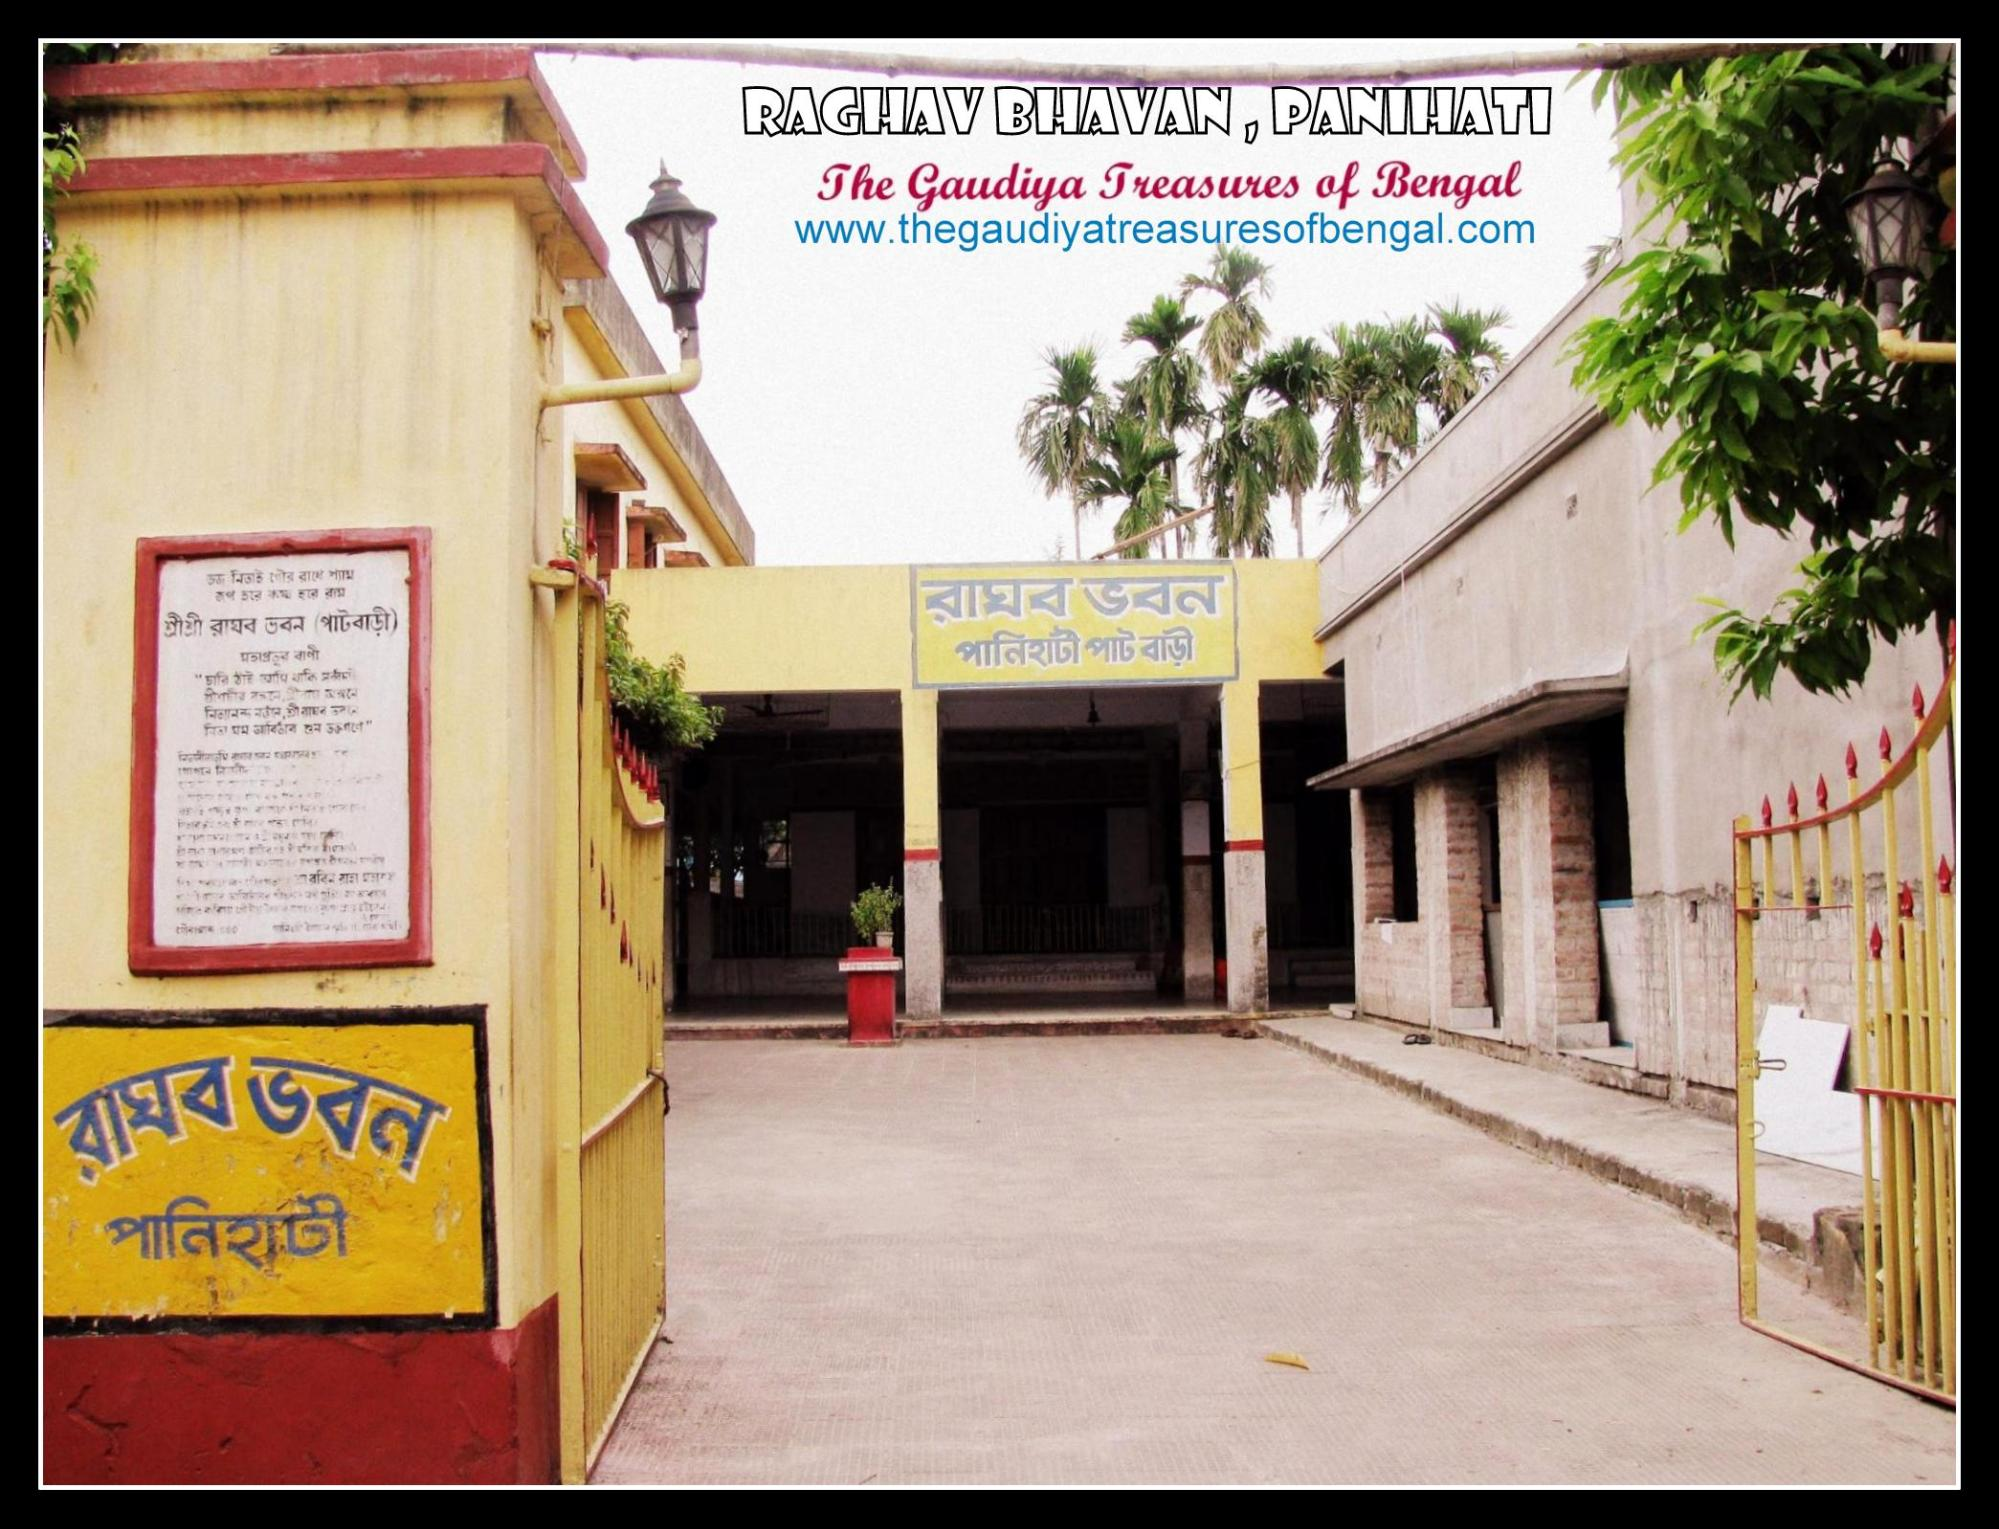 raghava bhavan